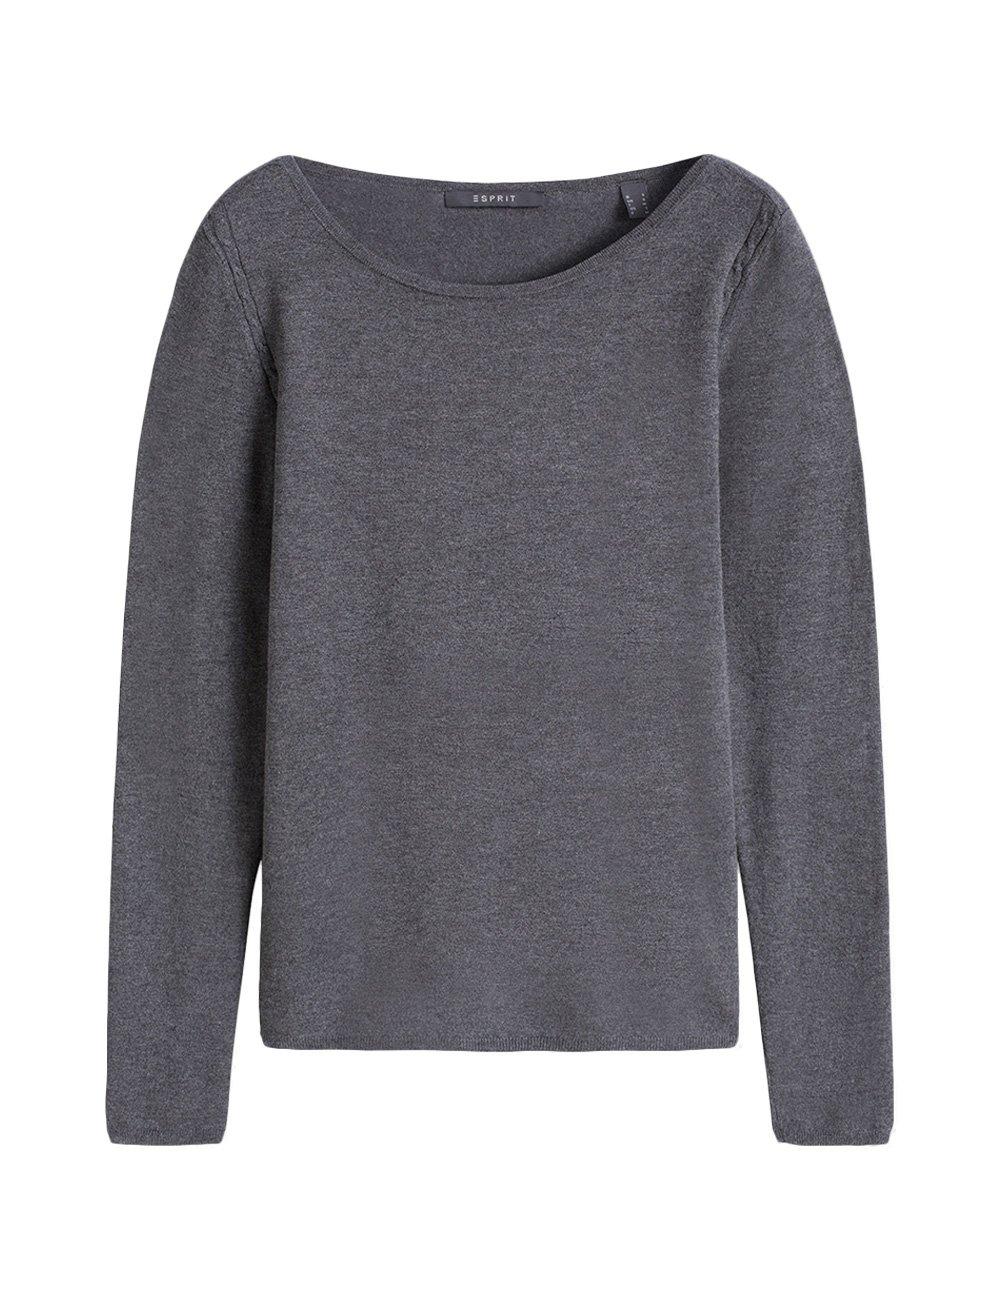 Esprit Women's Basic Fine Knit Jumper in Size XL Grey